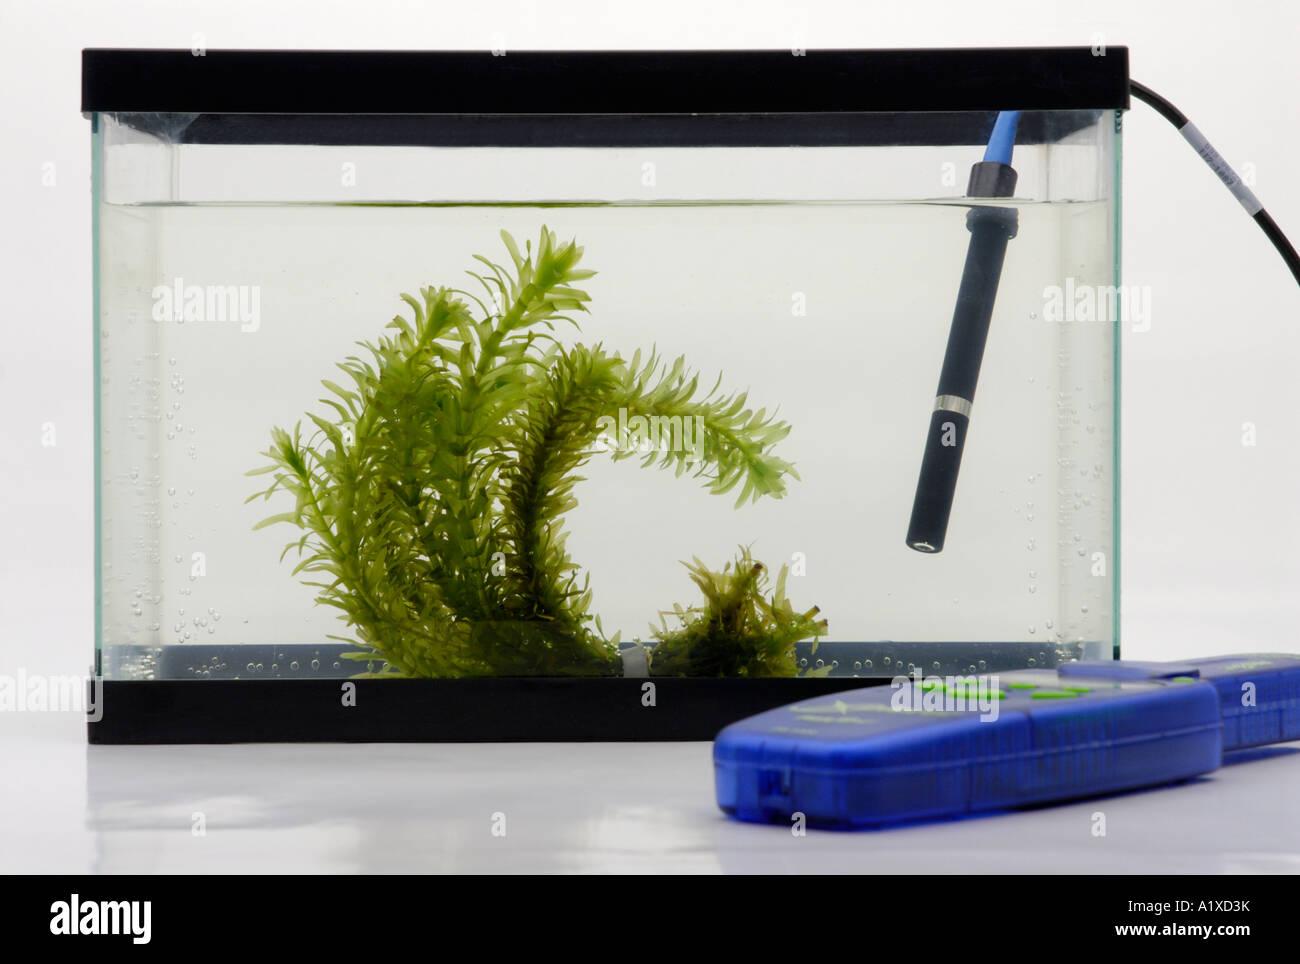 Dissolved oxygen sensor and aquatic plant - Stock Image